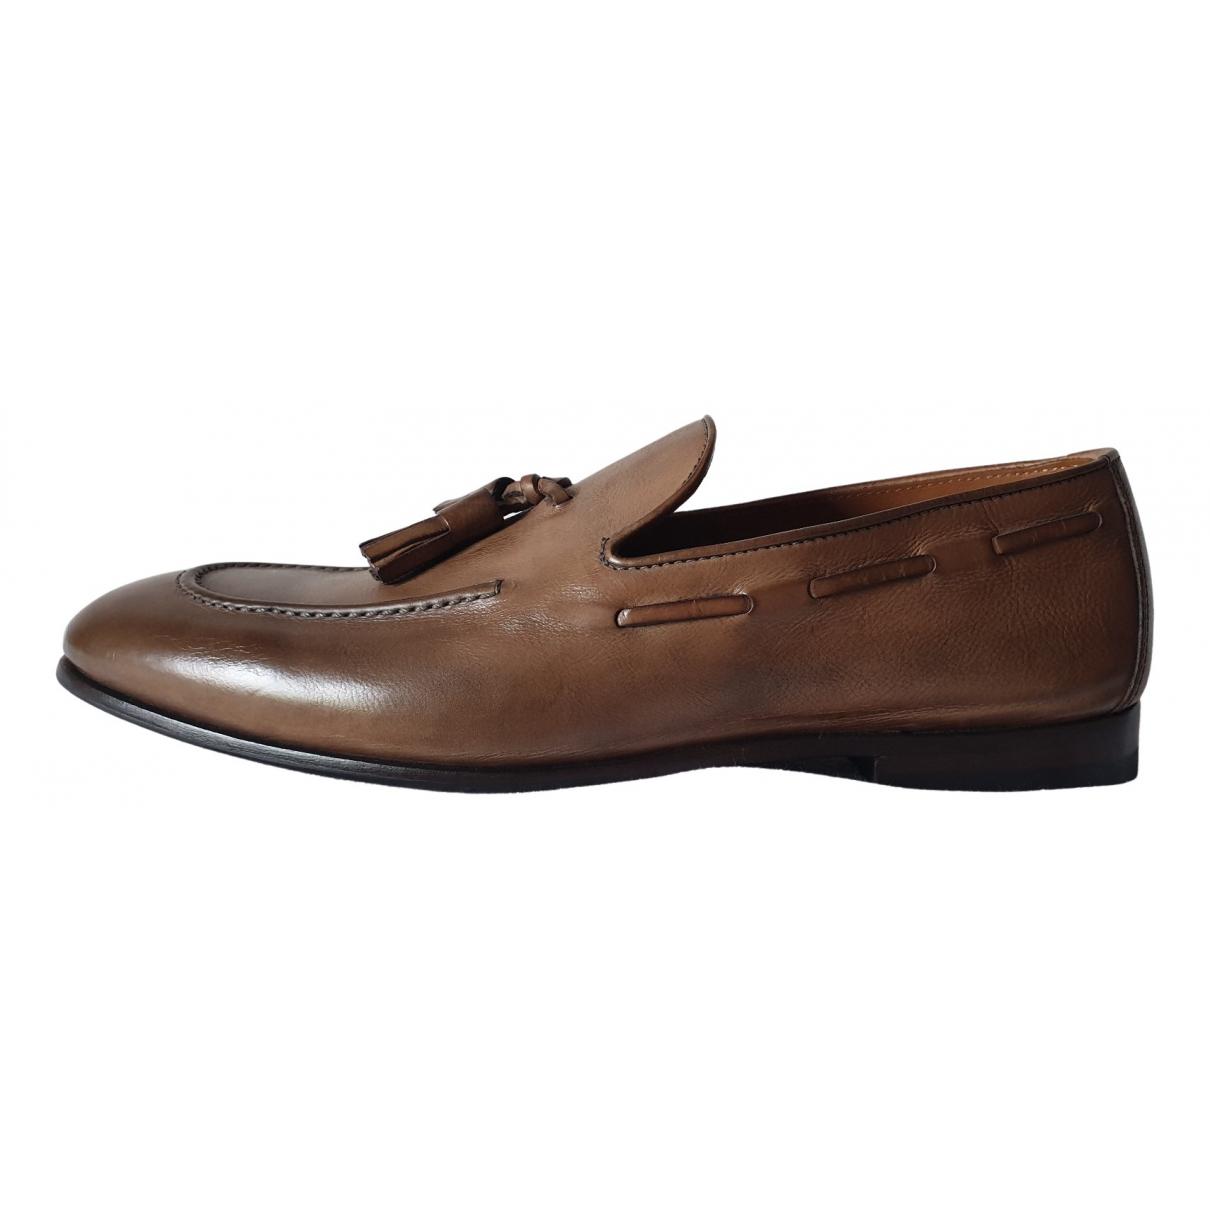 Brunello Cucinelli \N Brown Leather Flats for Men 39 EU